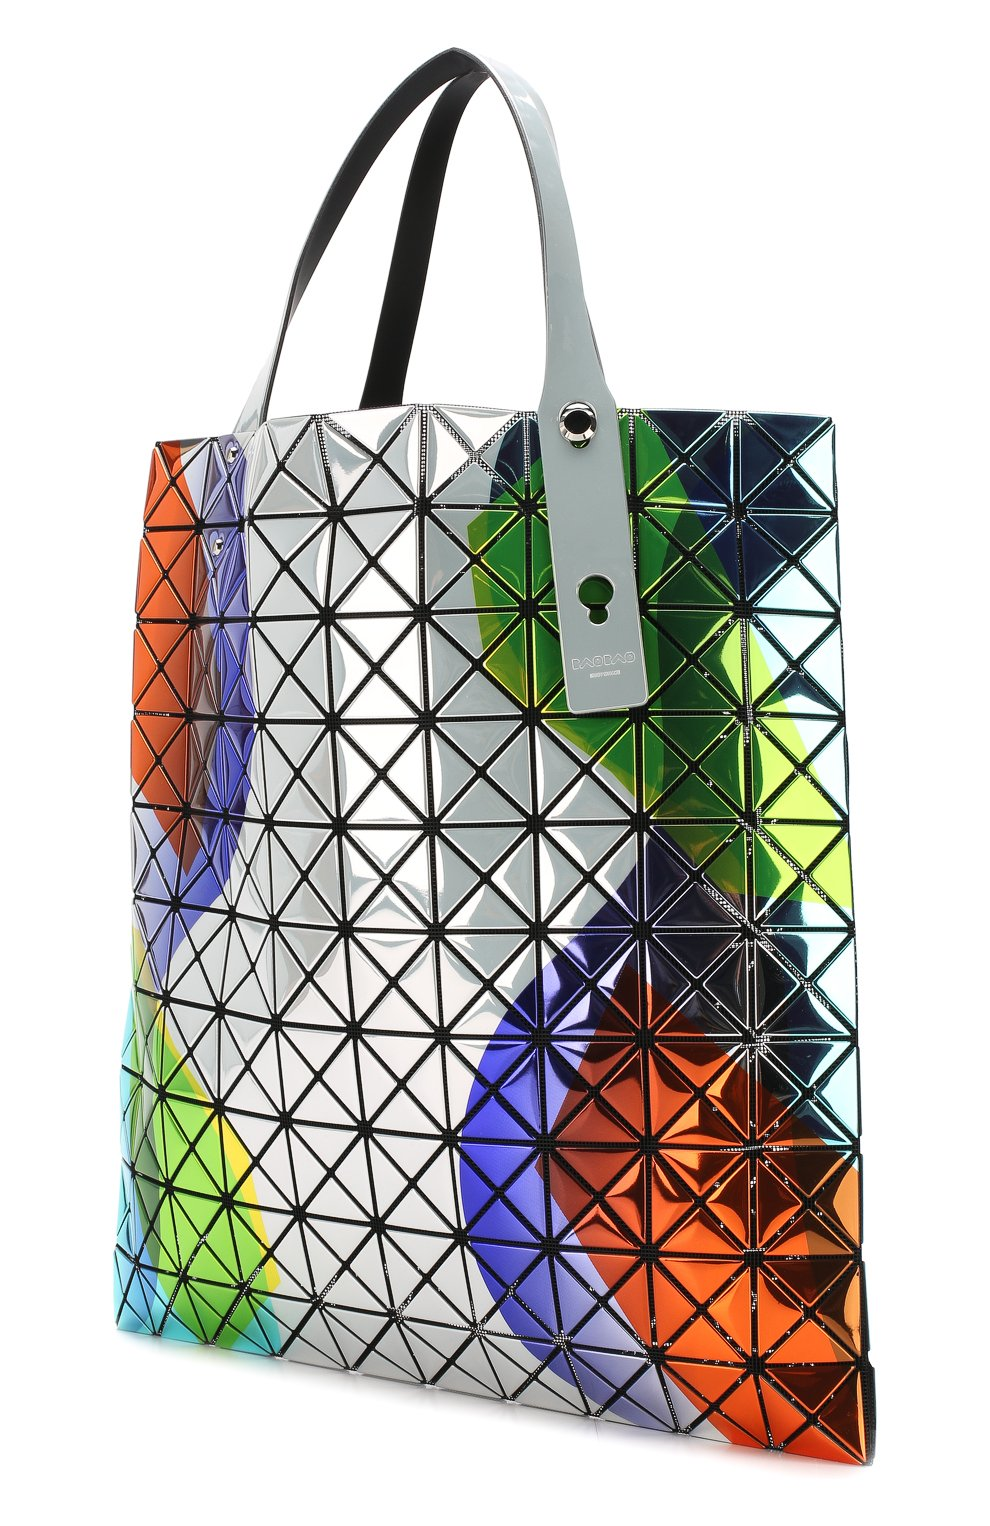 Сумка-тоут Prism Bao Bao ISSEY MIYAKE разноцветная цвета | Фото №3